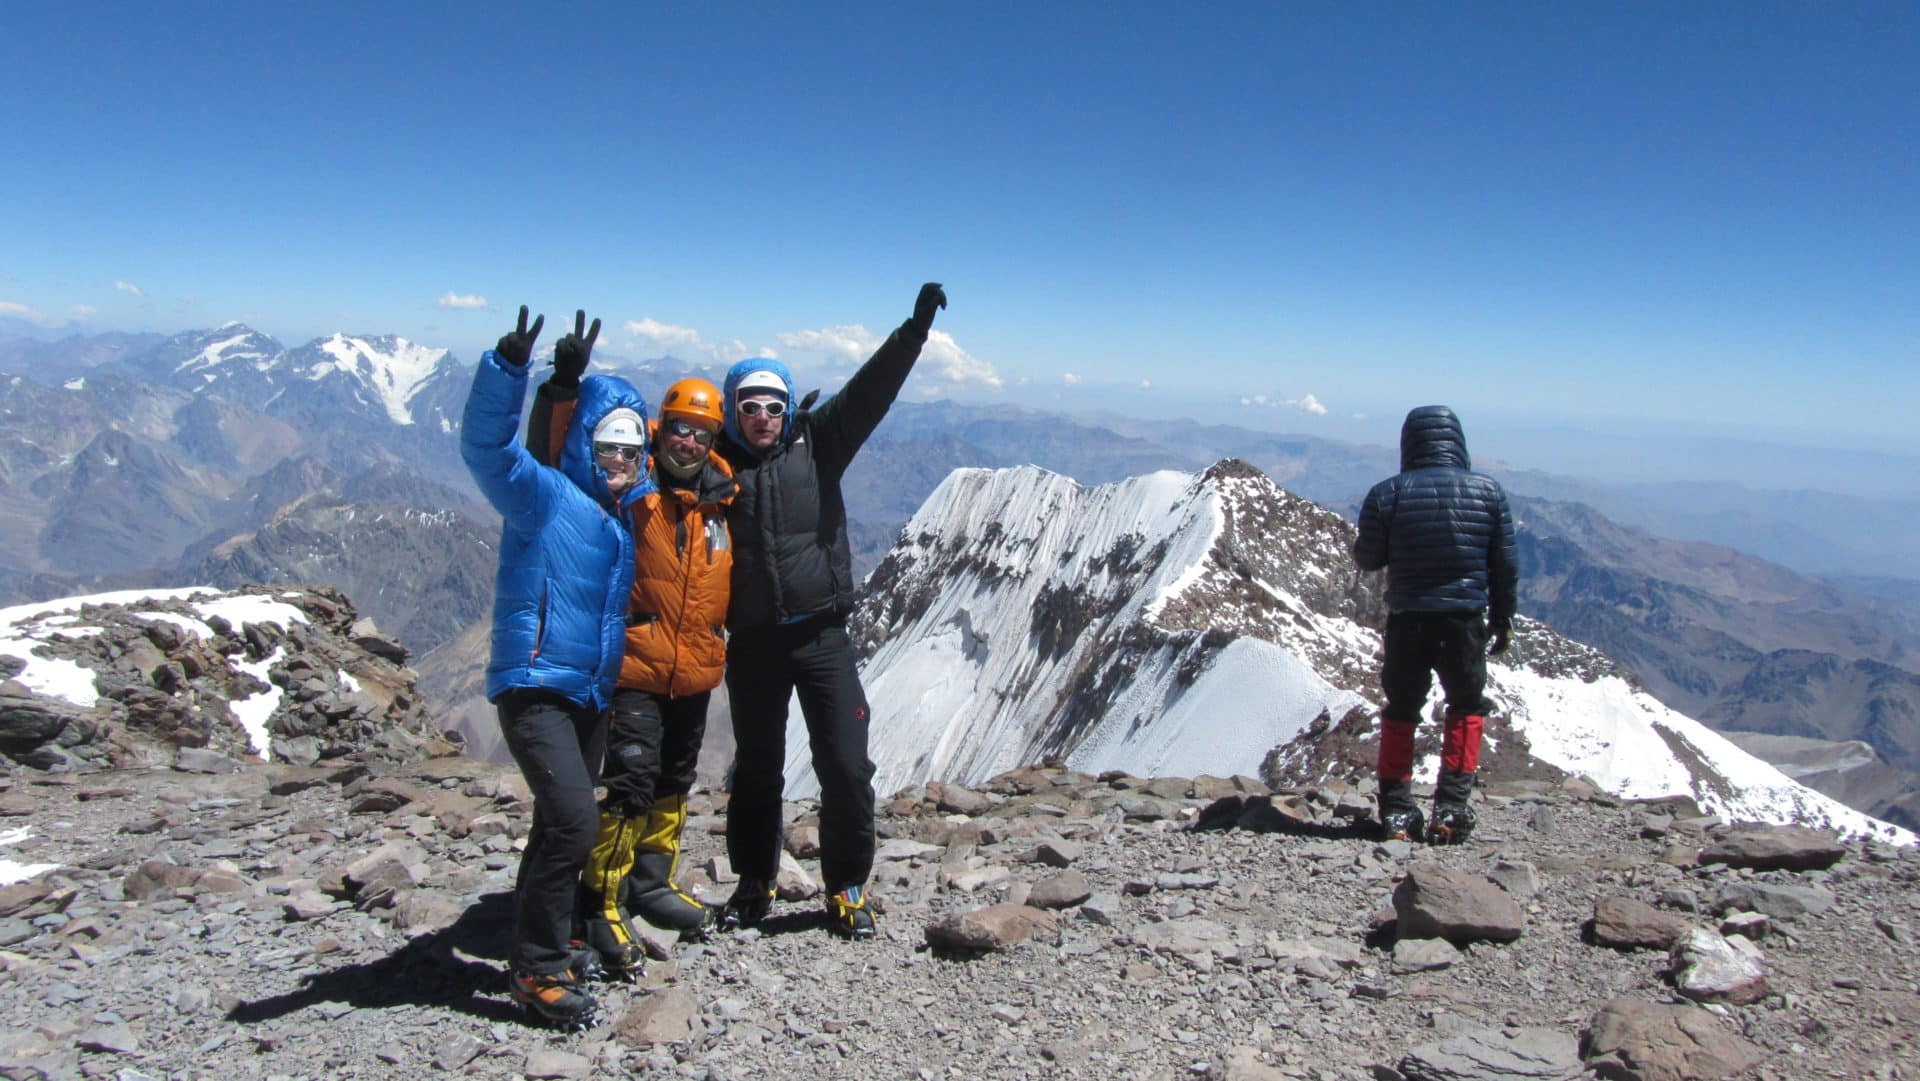 Ascent to Mount Aconcagua, 6962 m